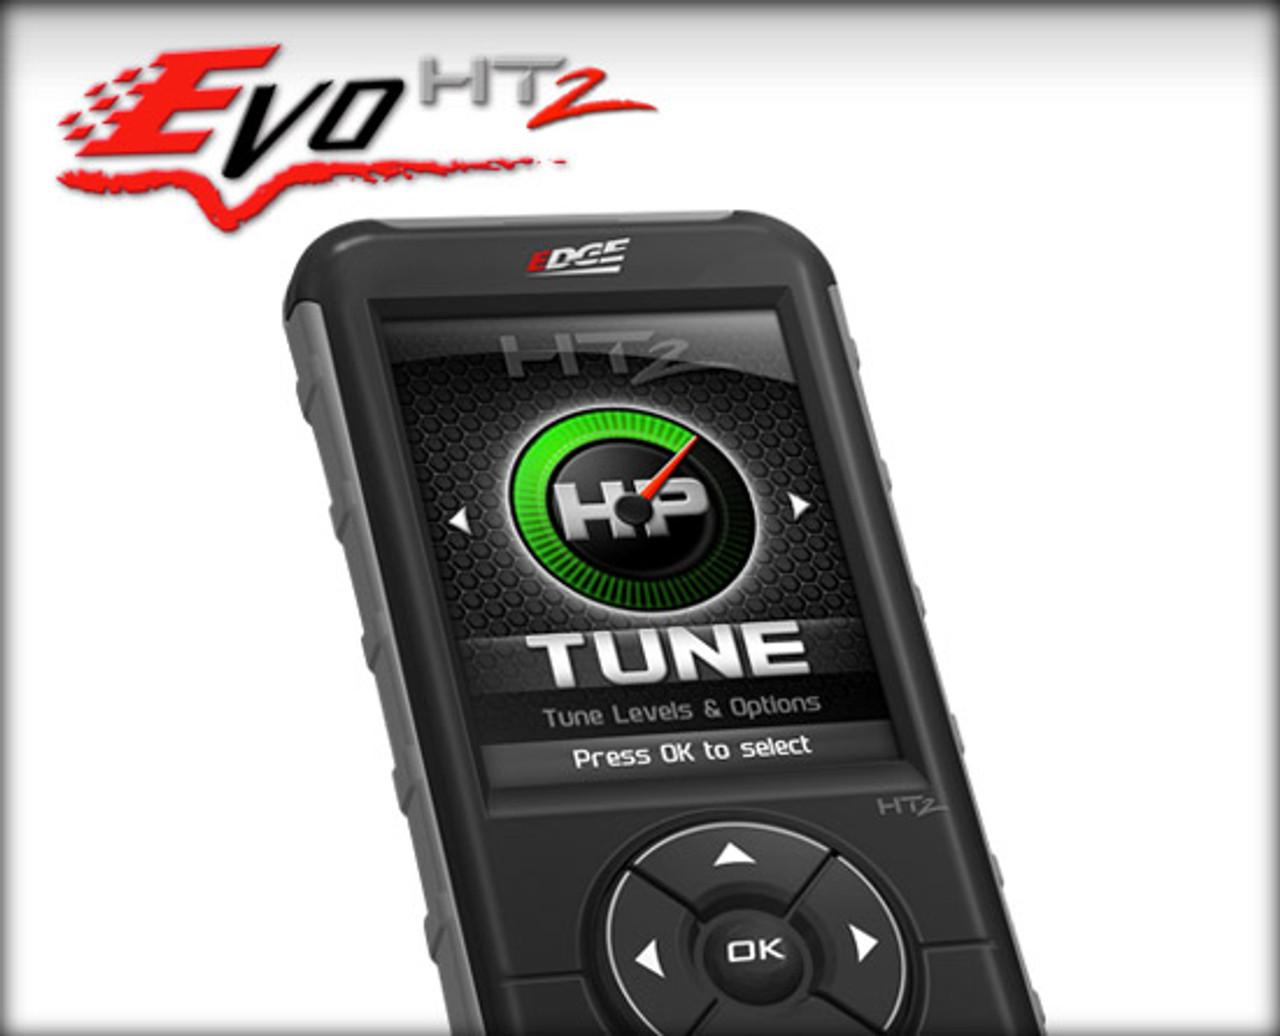 Edge EVO HT2 Programmer Hand-held Performance Tuner Dodge Cummins 2003-2012